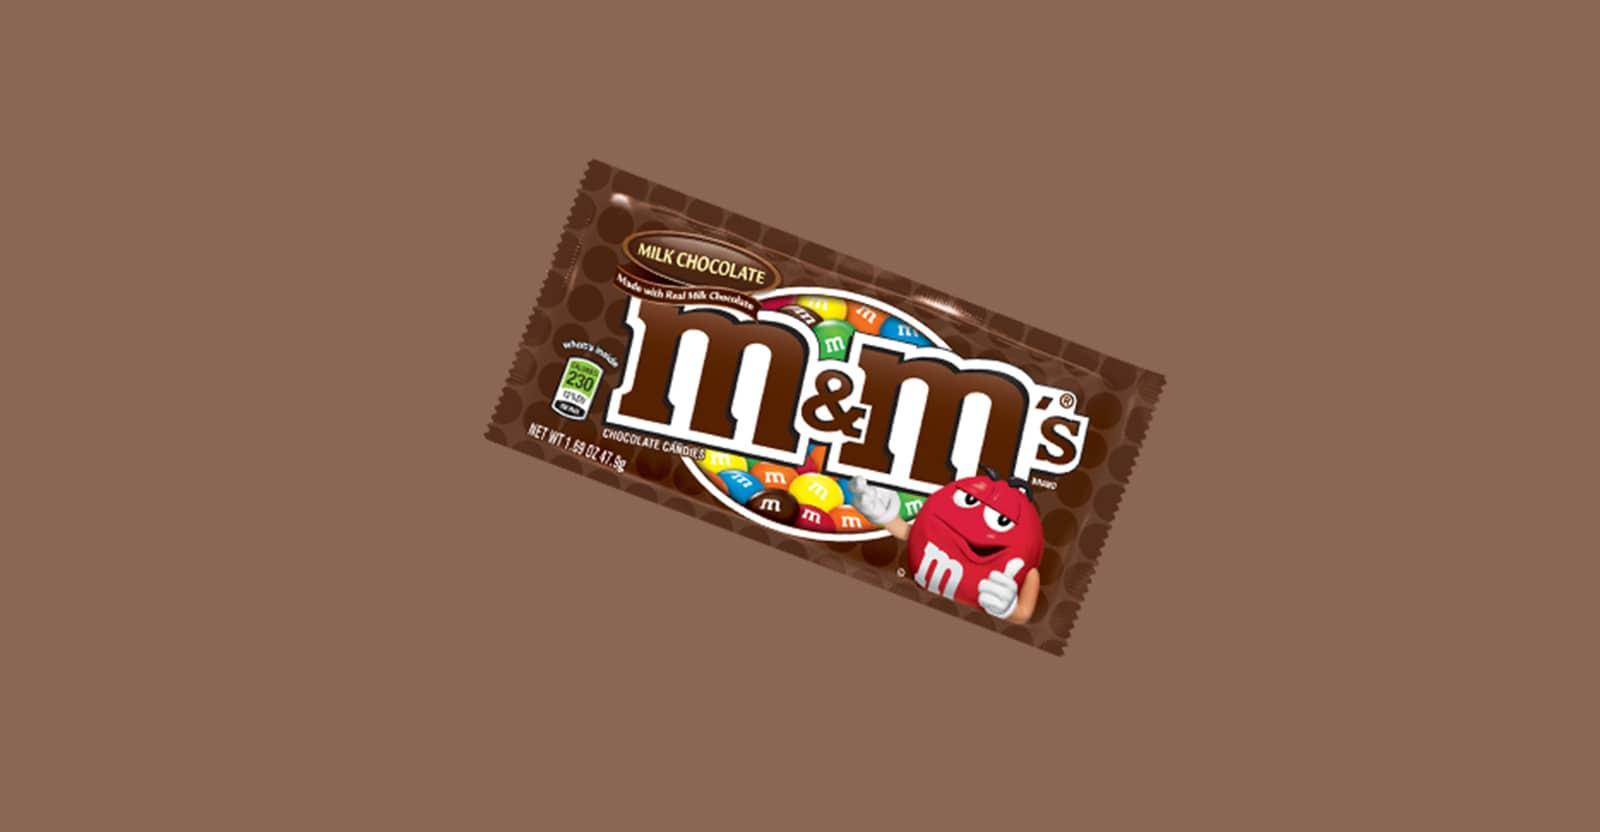 are mms gluten free